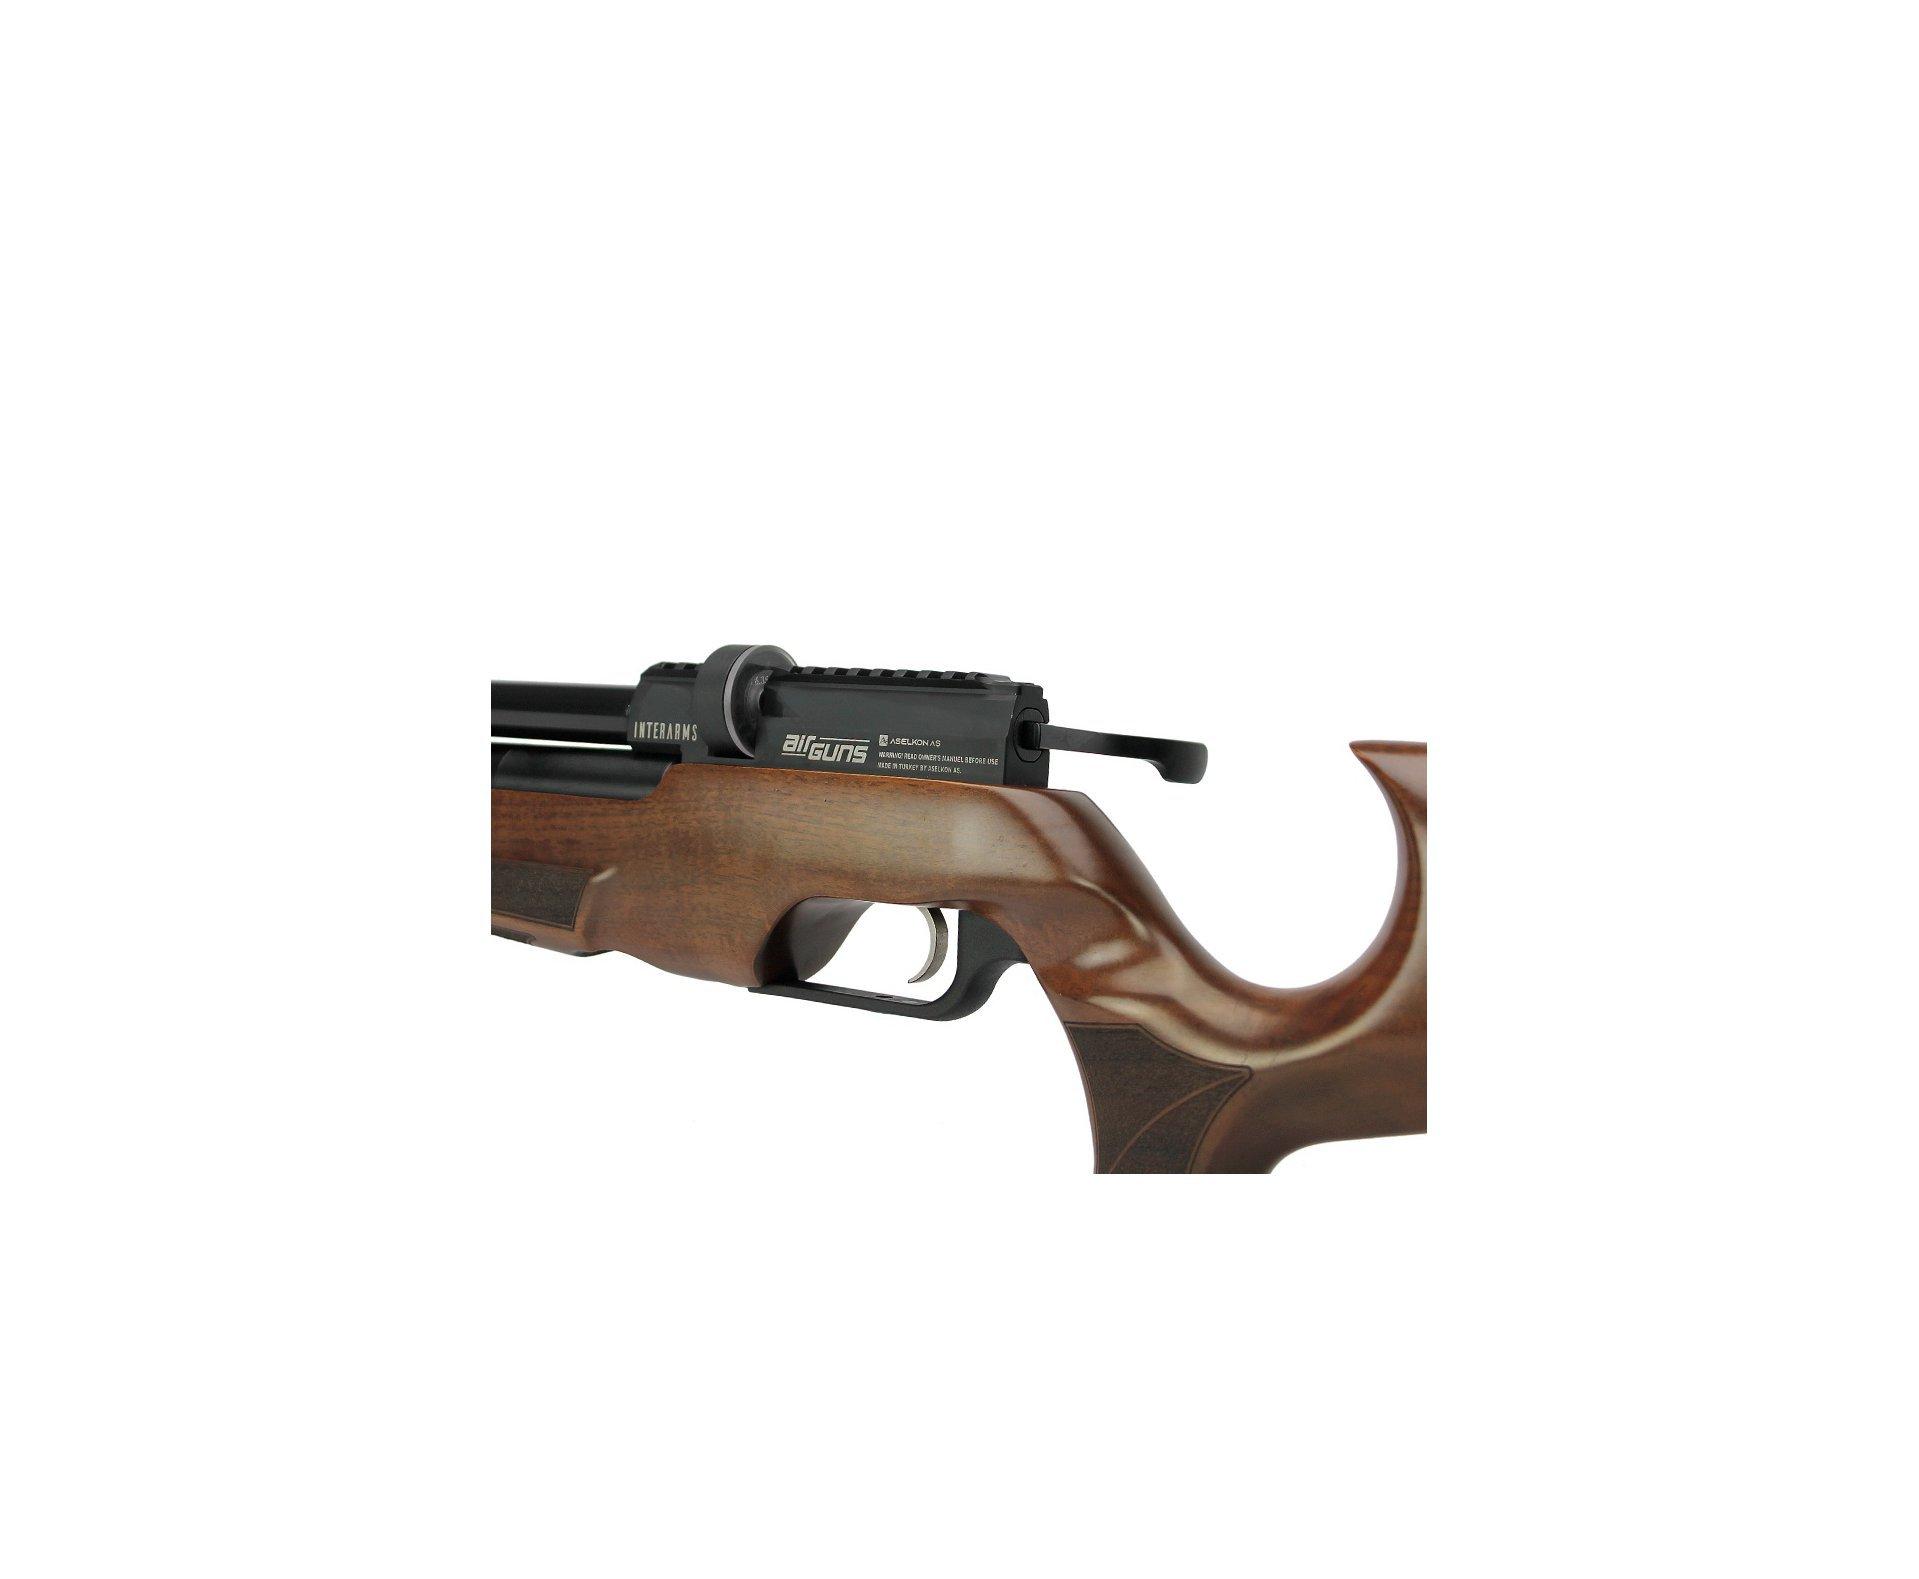 Artefato de Pressão PCP MX5 Matte Black Wood Regulated 6.35mm Aselkon